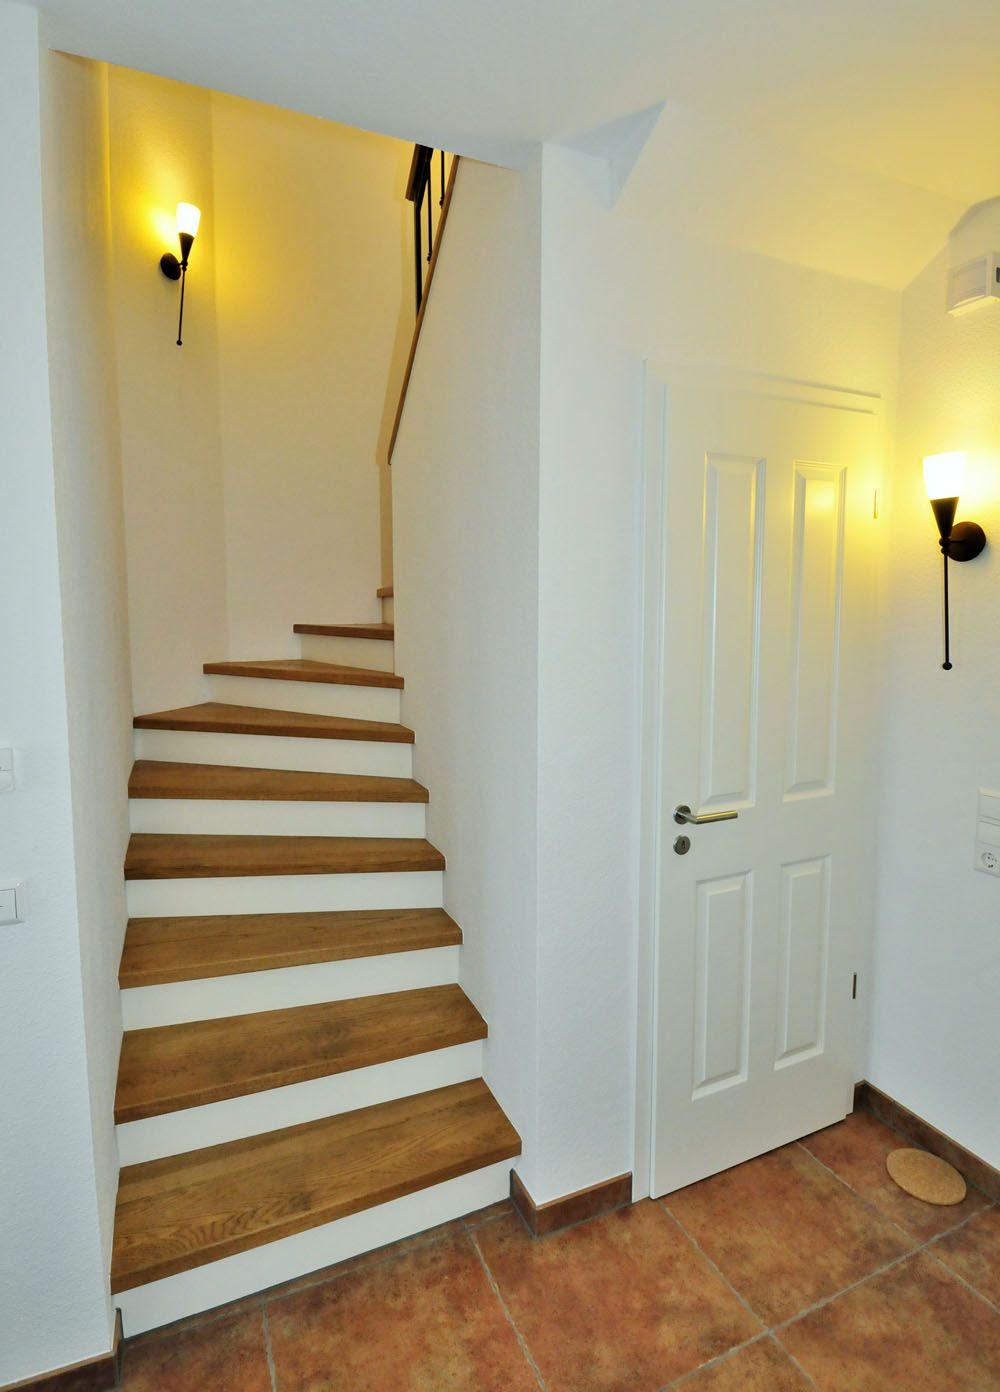 Betontreppe mit holz 15 1 haus eingang treppe for Garderobe treppenhaus